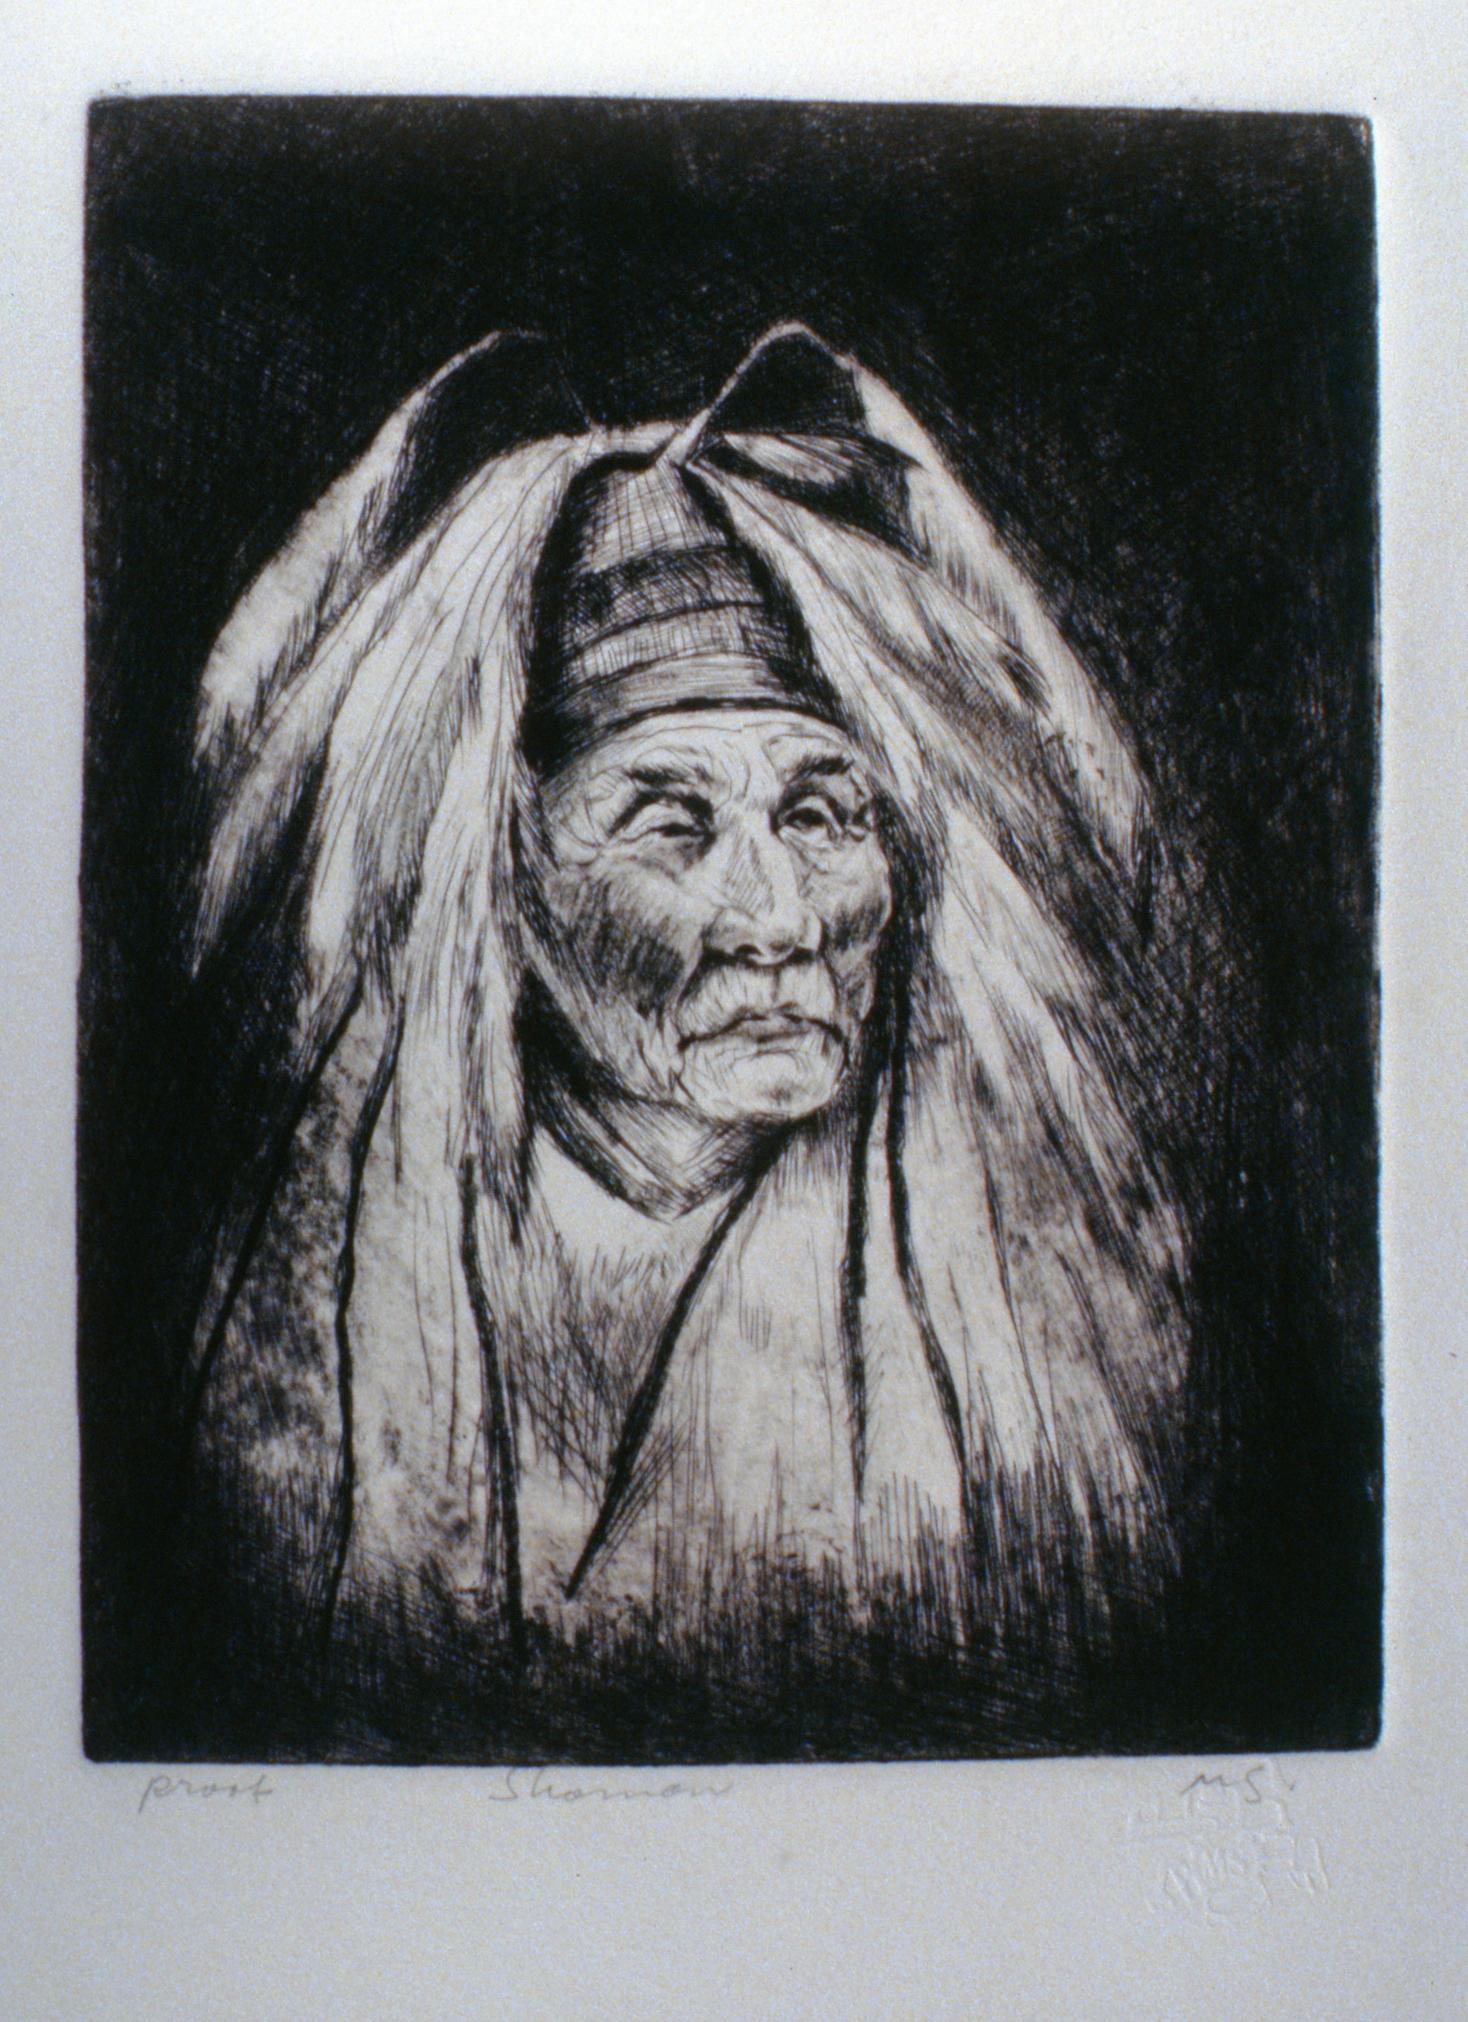 Shaman , 1980, Minn Sjølseth, artist proof, 25 x 20 cm, 1996.02.10